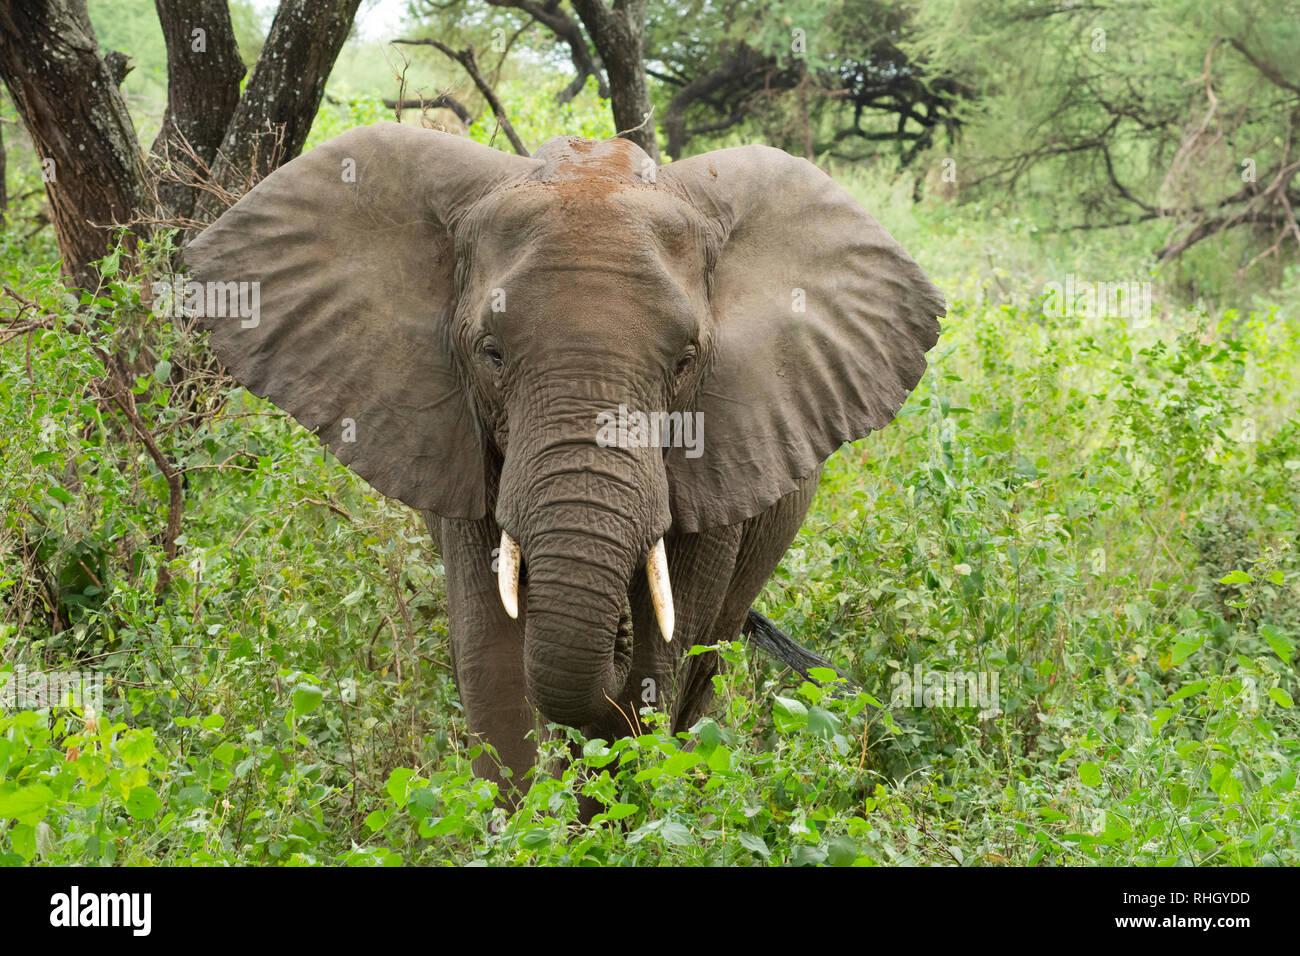 African Elephant, Loxodonta africana, in Lake Manyara National Park, Tanzania - Stock Image